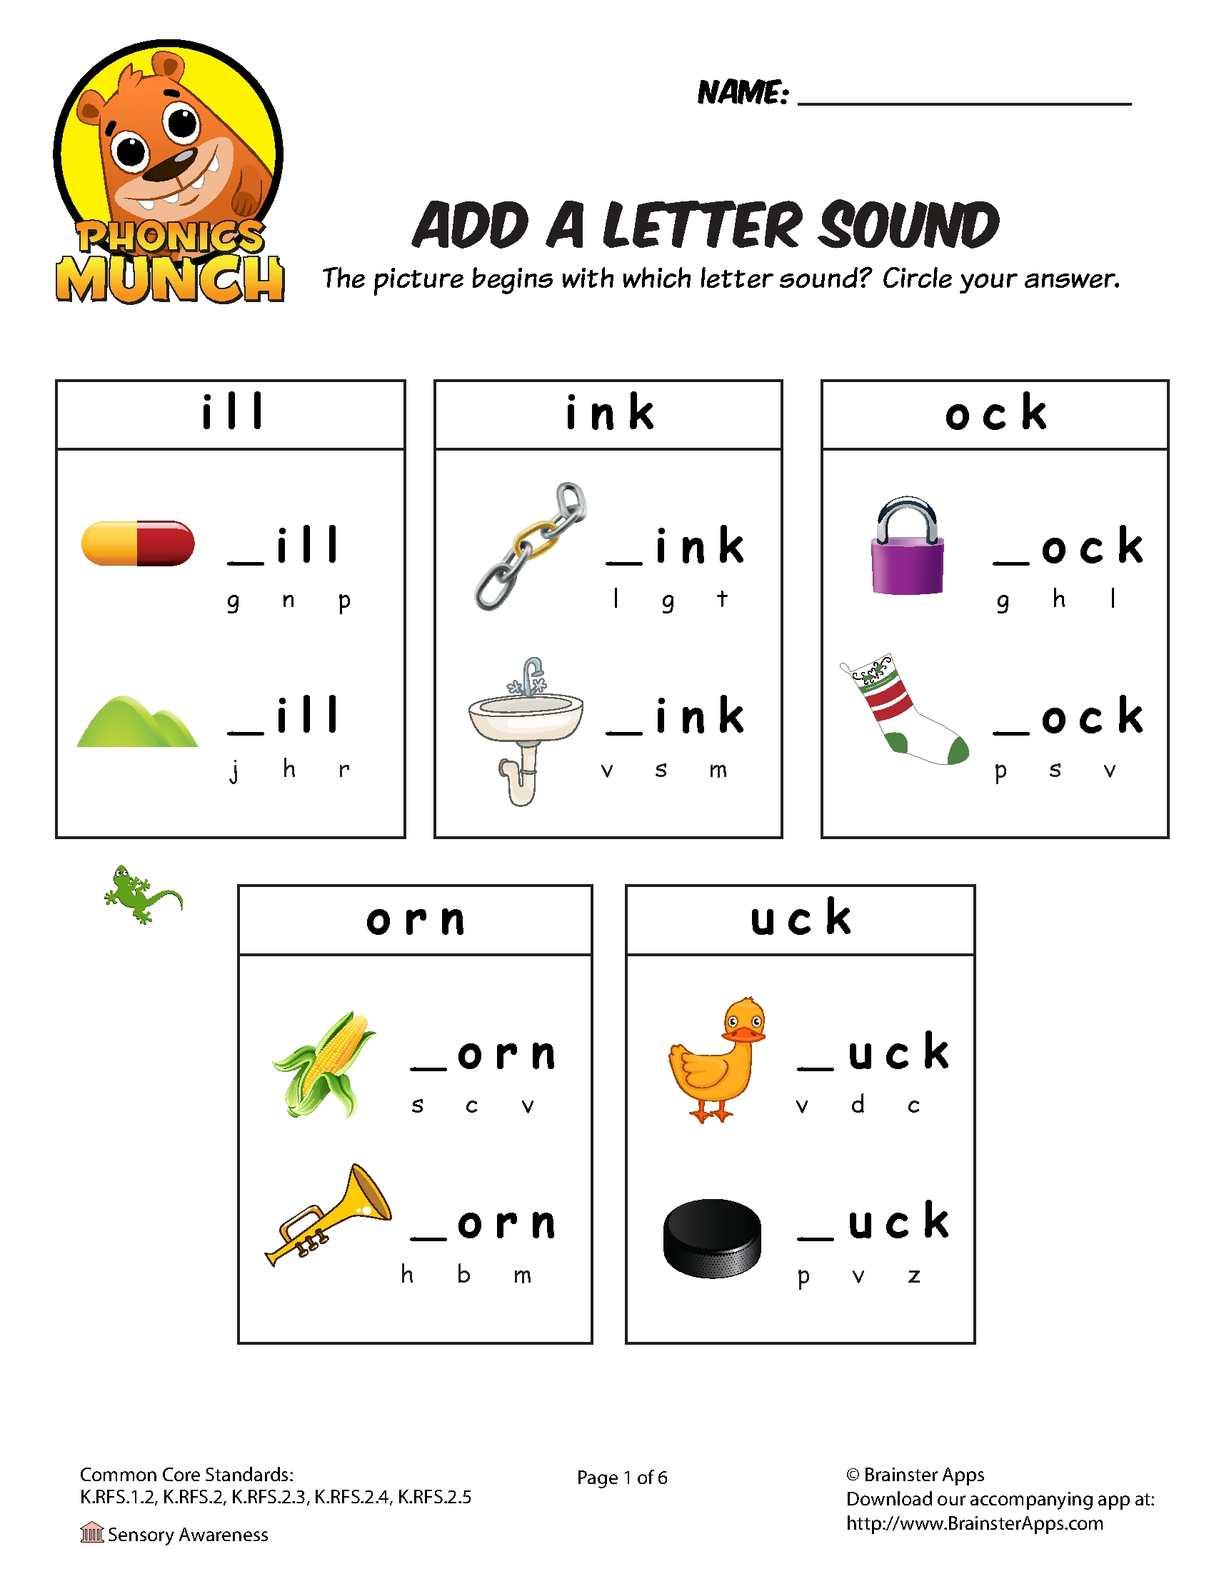 Calaméo - Add A Letter Sound Phonics Worksheet